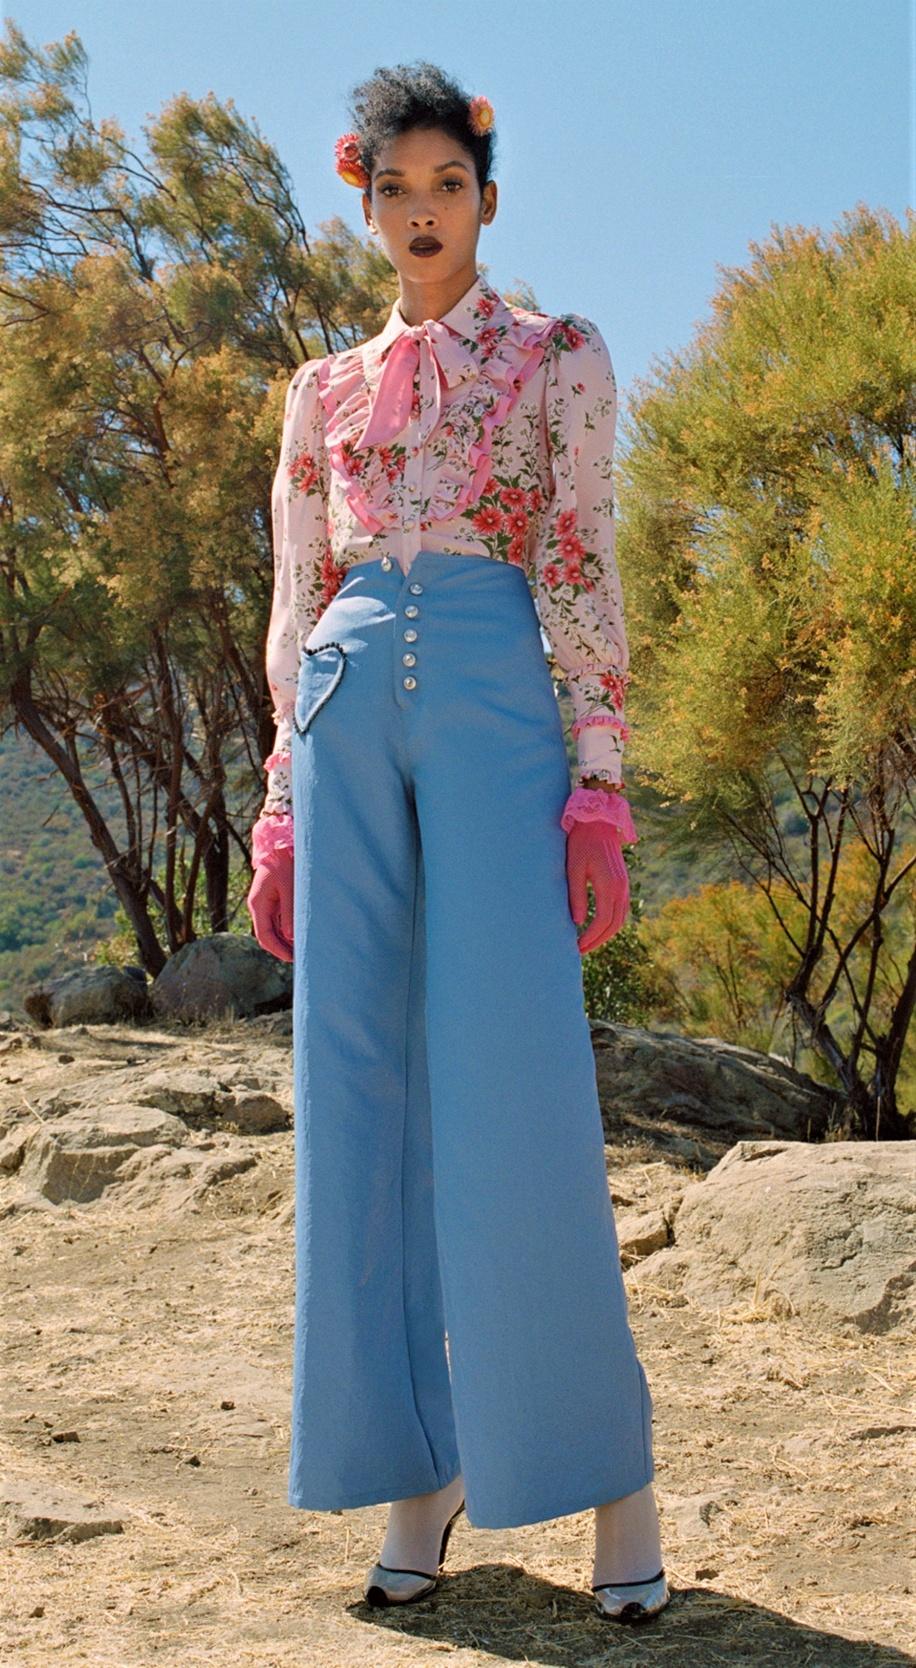 00018-rodarte-spring-21-rtw-credit-Daria-Kobayashi-Ritch blue pants pk top pynck (2) cropped.jpg